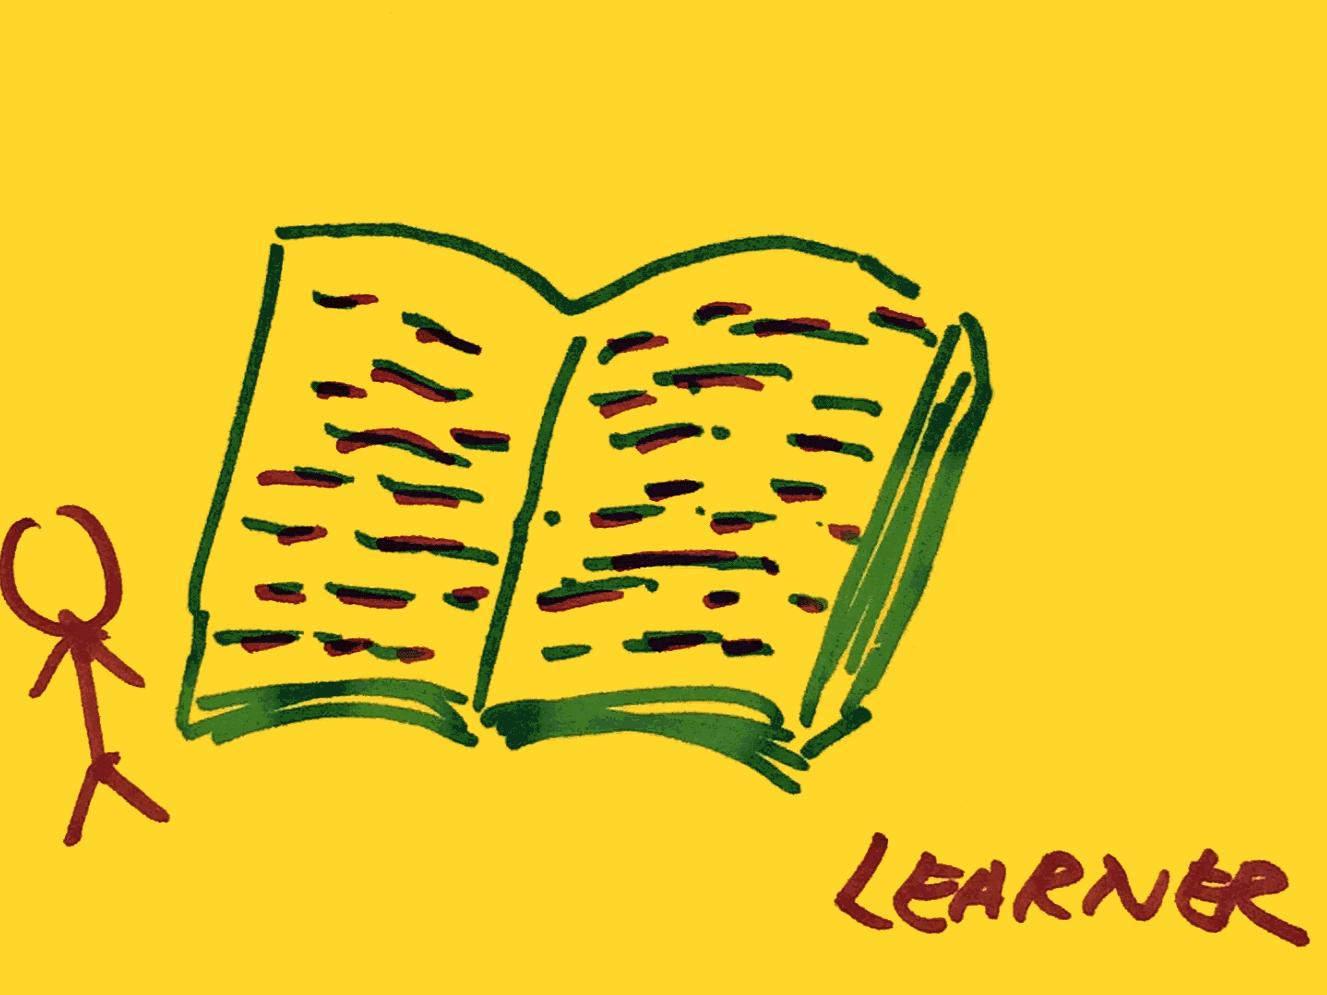 Learner Strengthsfinder Big Book Small Guy